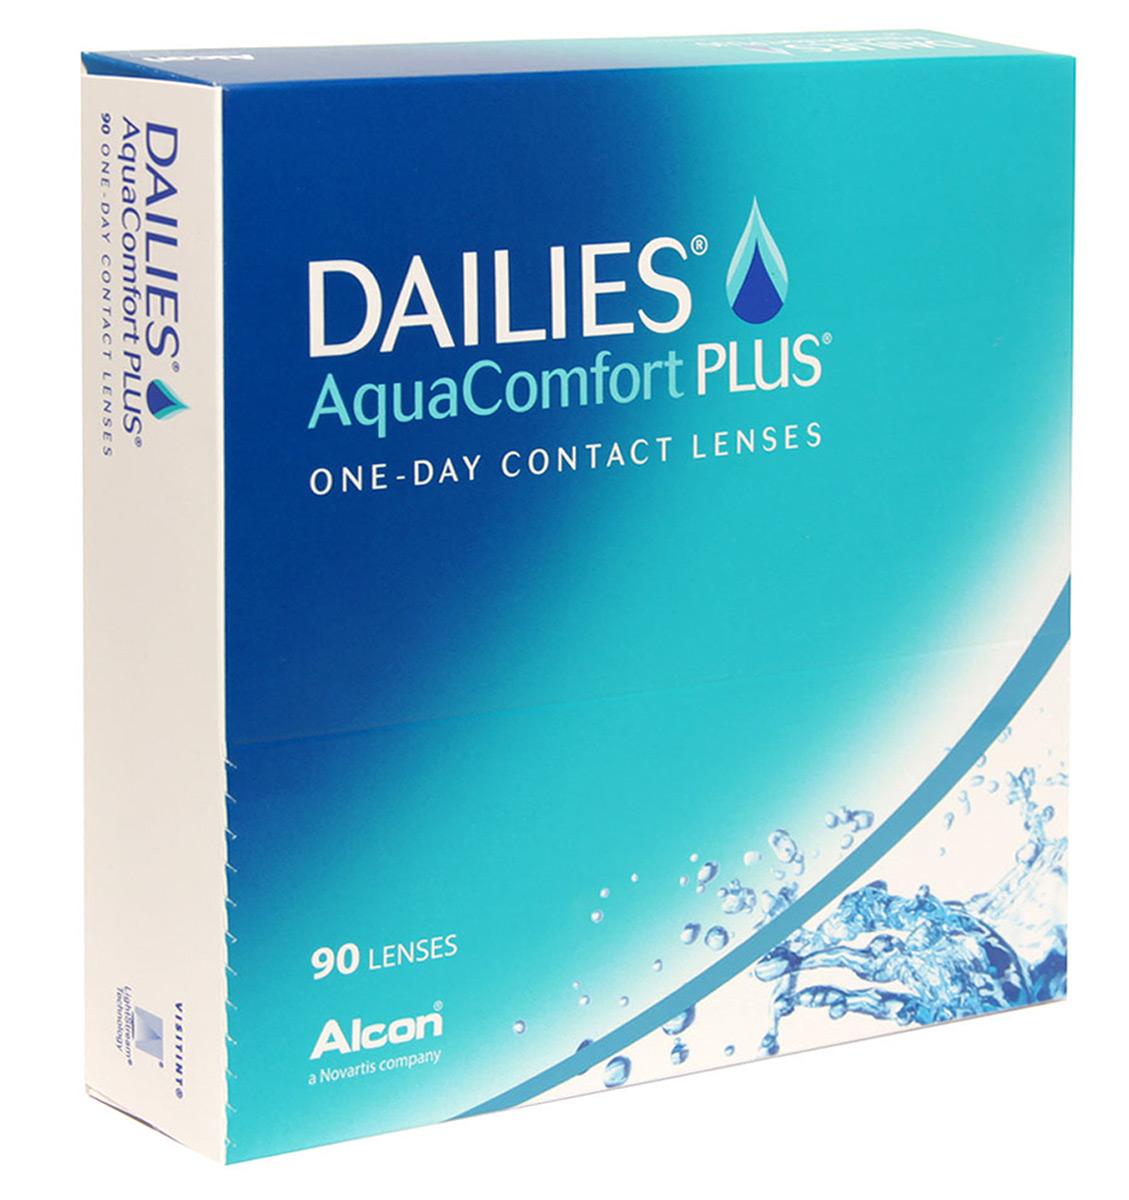 Alcon-CIBA Vision контактные линзы Dailies AquaComfort Plus (90шт / 8.7 / 14.0 / -1.50)